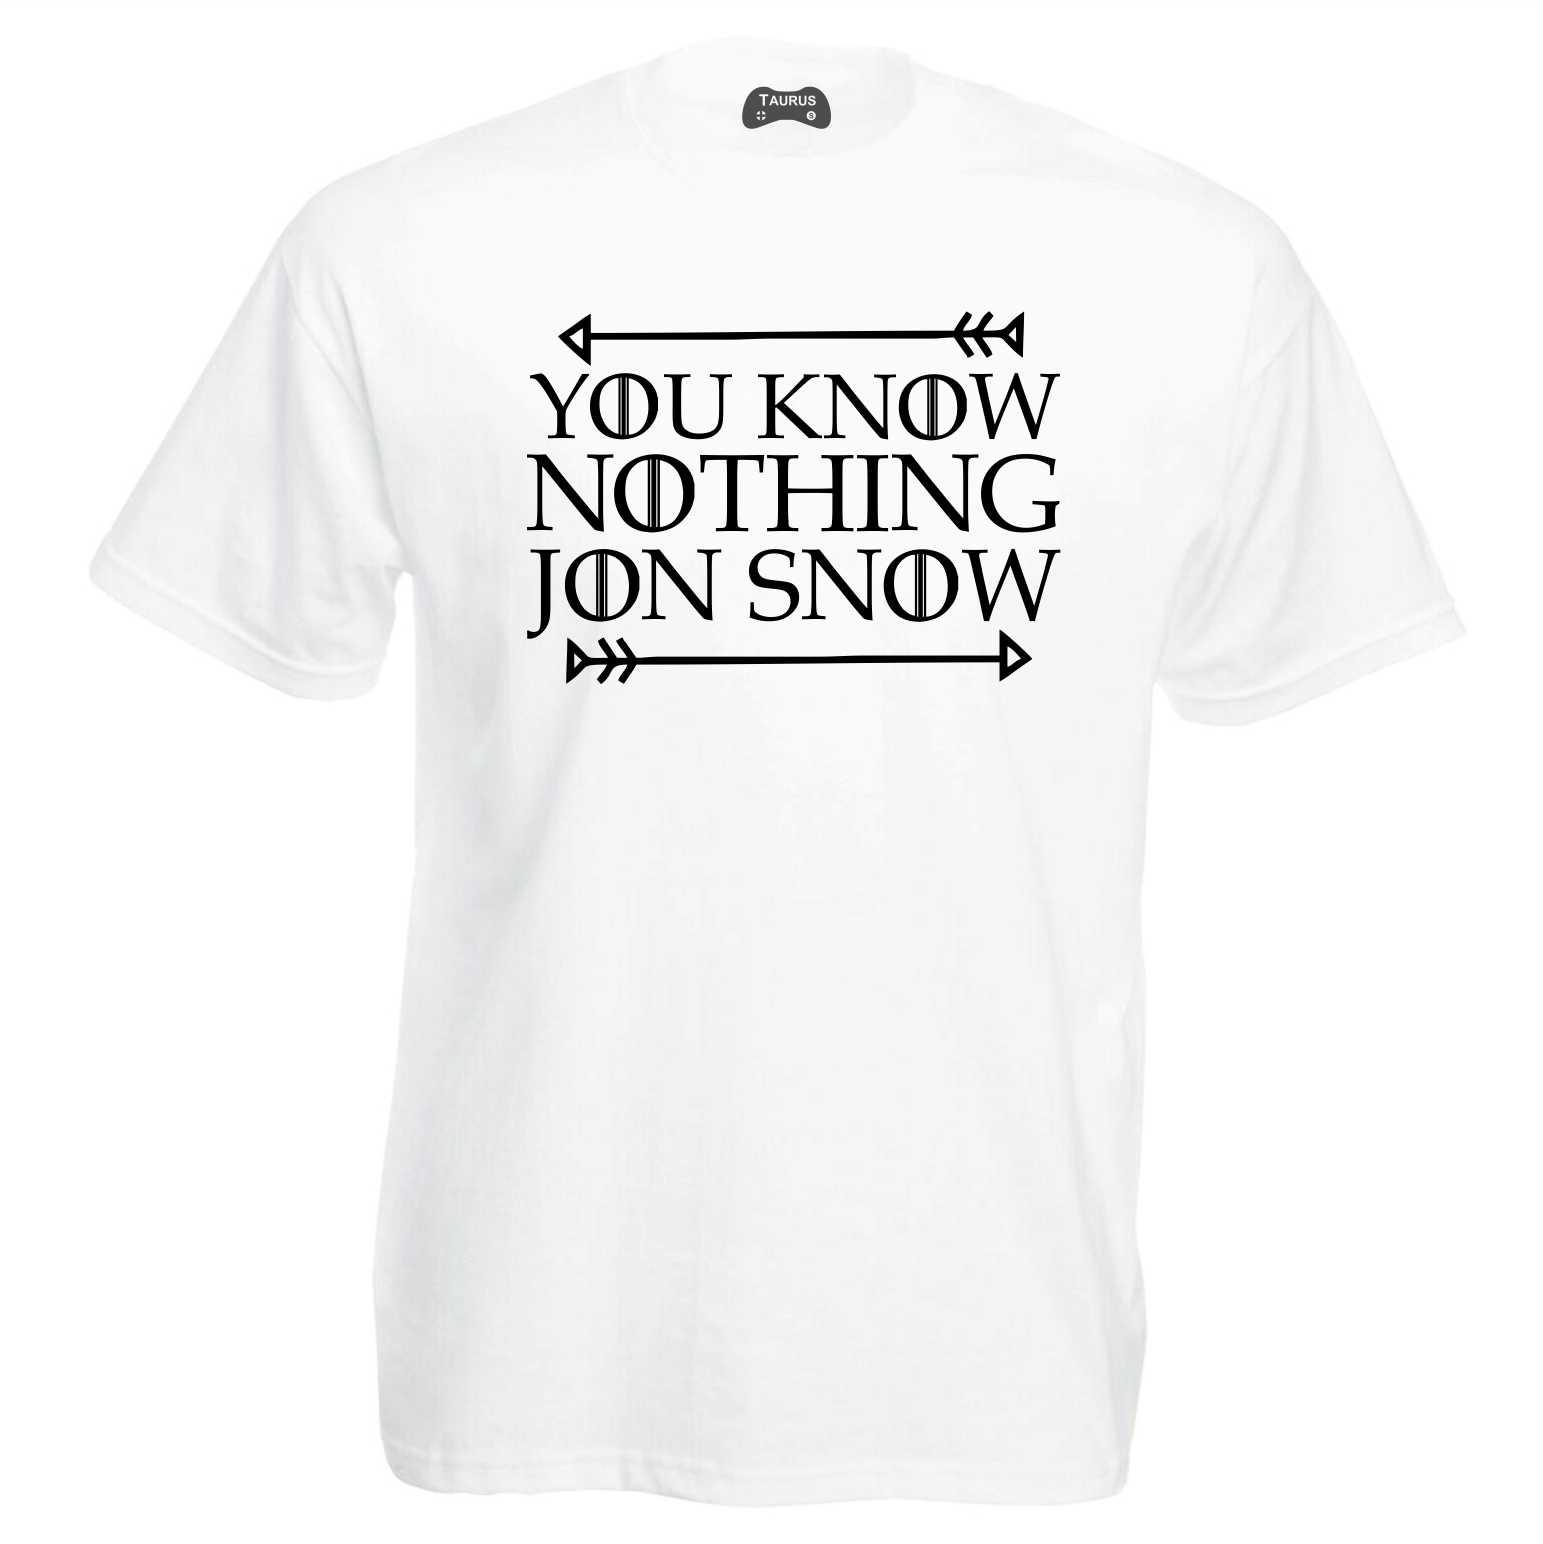 Game Of Thrones T-Shirt Jon Snow